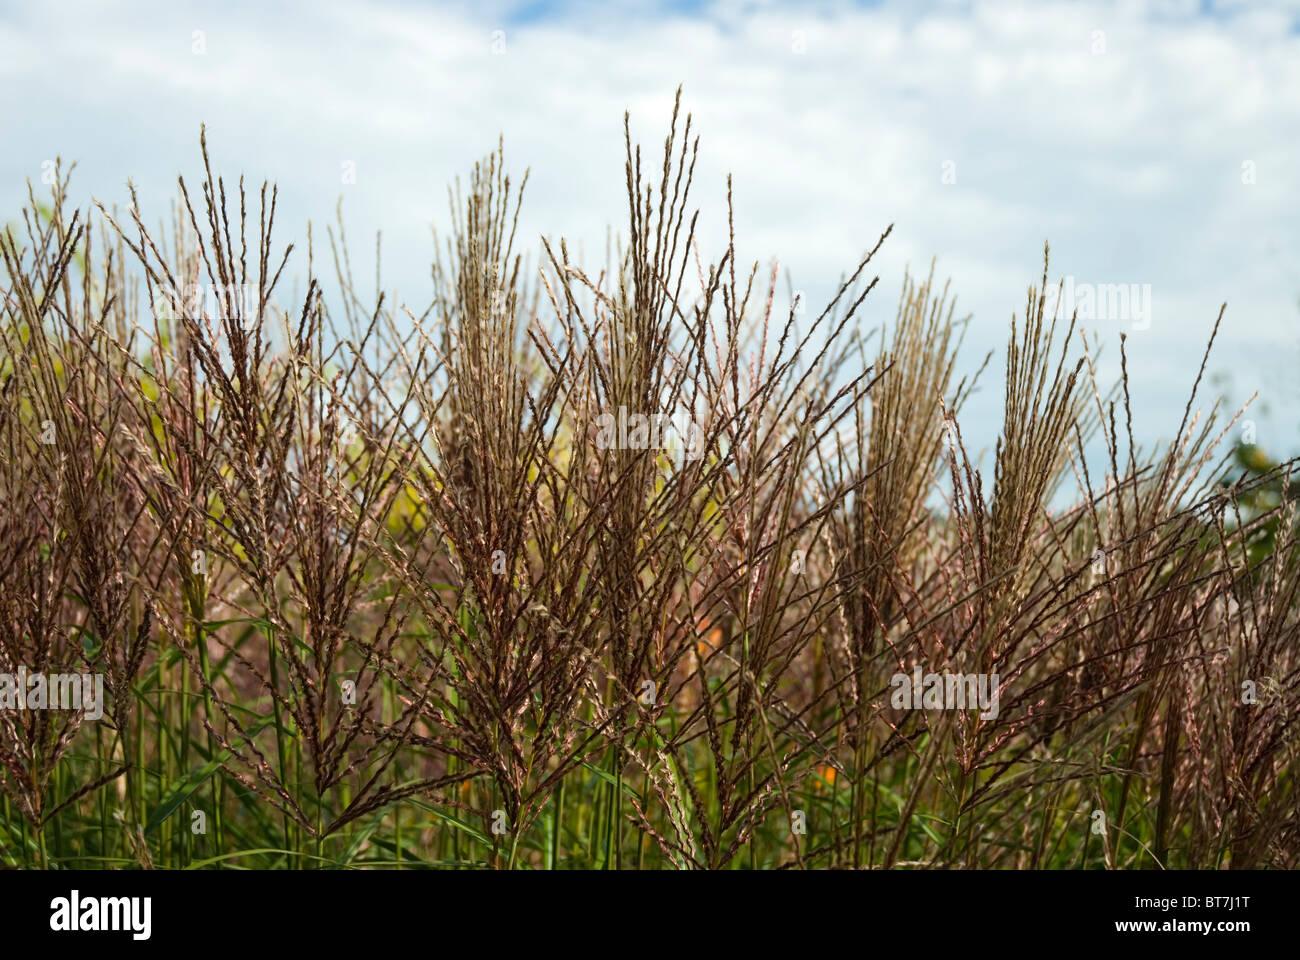 Miscanthus sinensis 'Krater', grasses - Stock Image